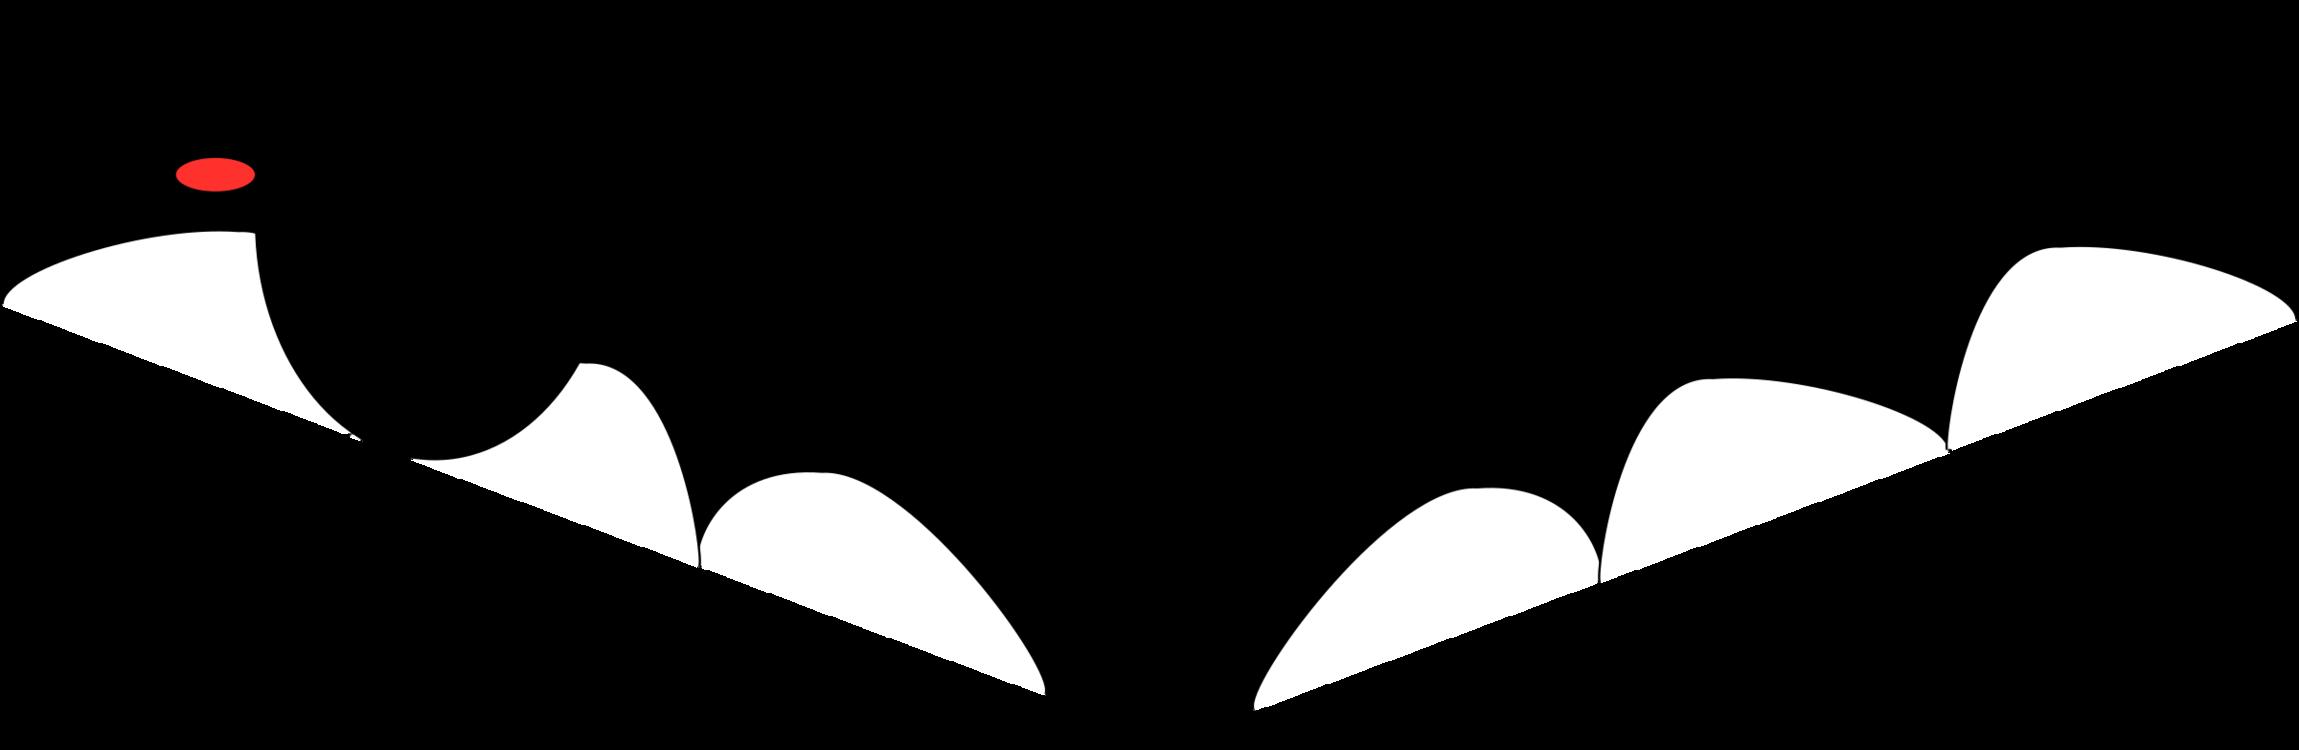 Vampire bat Drawing Wall decal Halloween